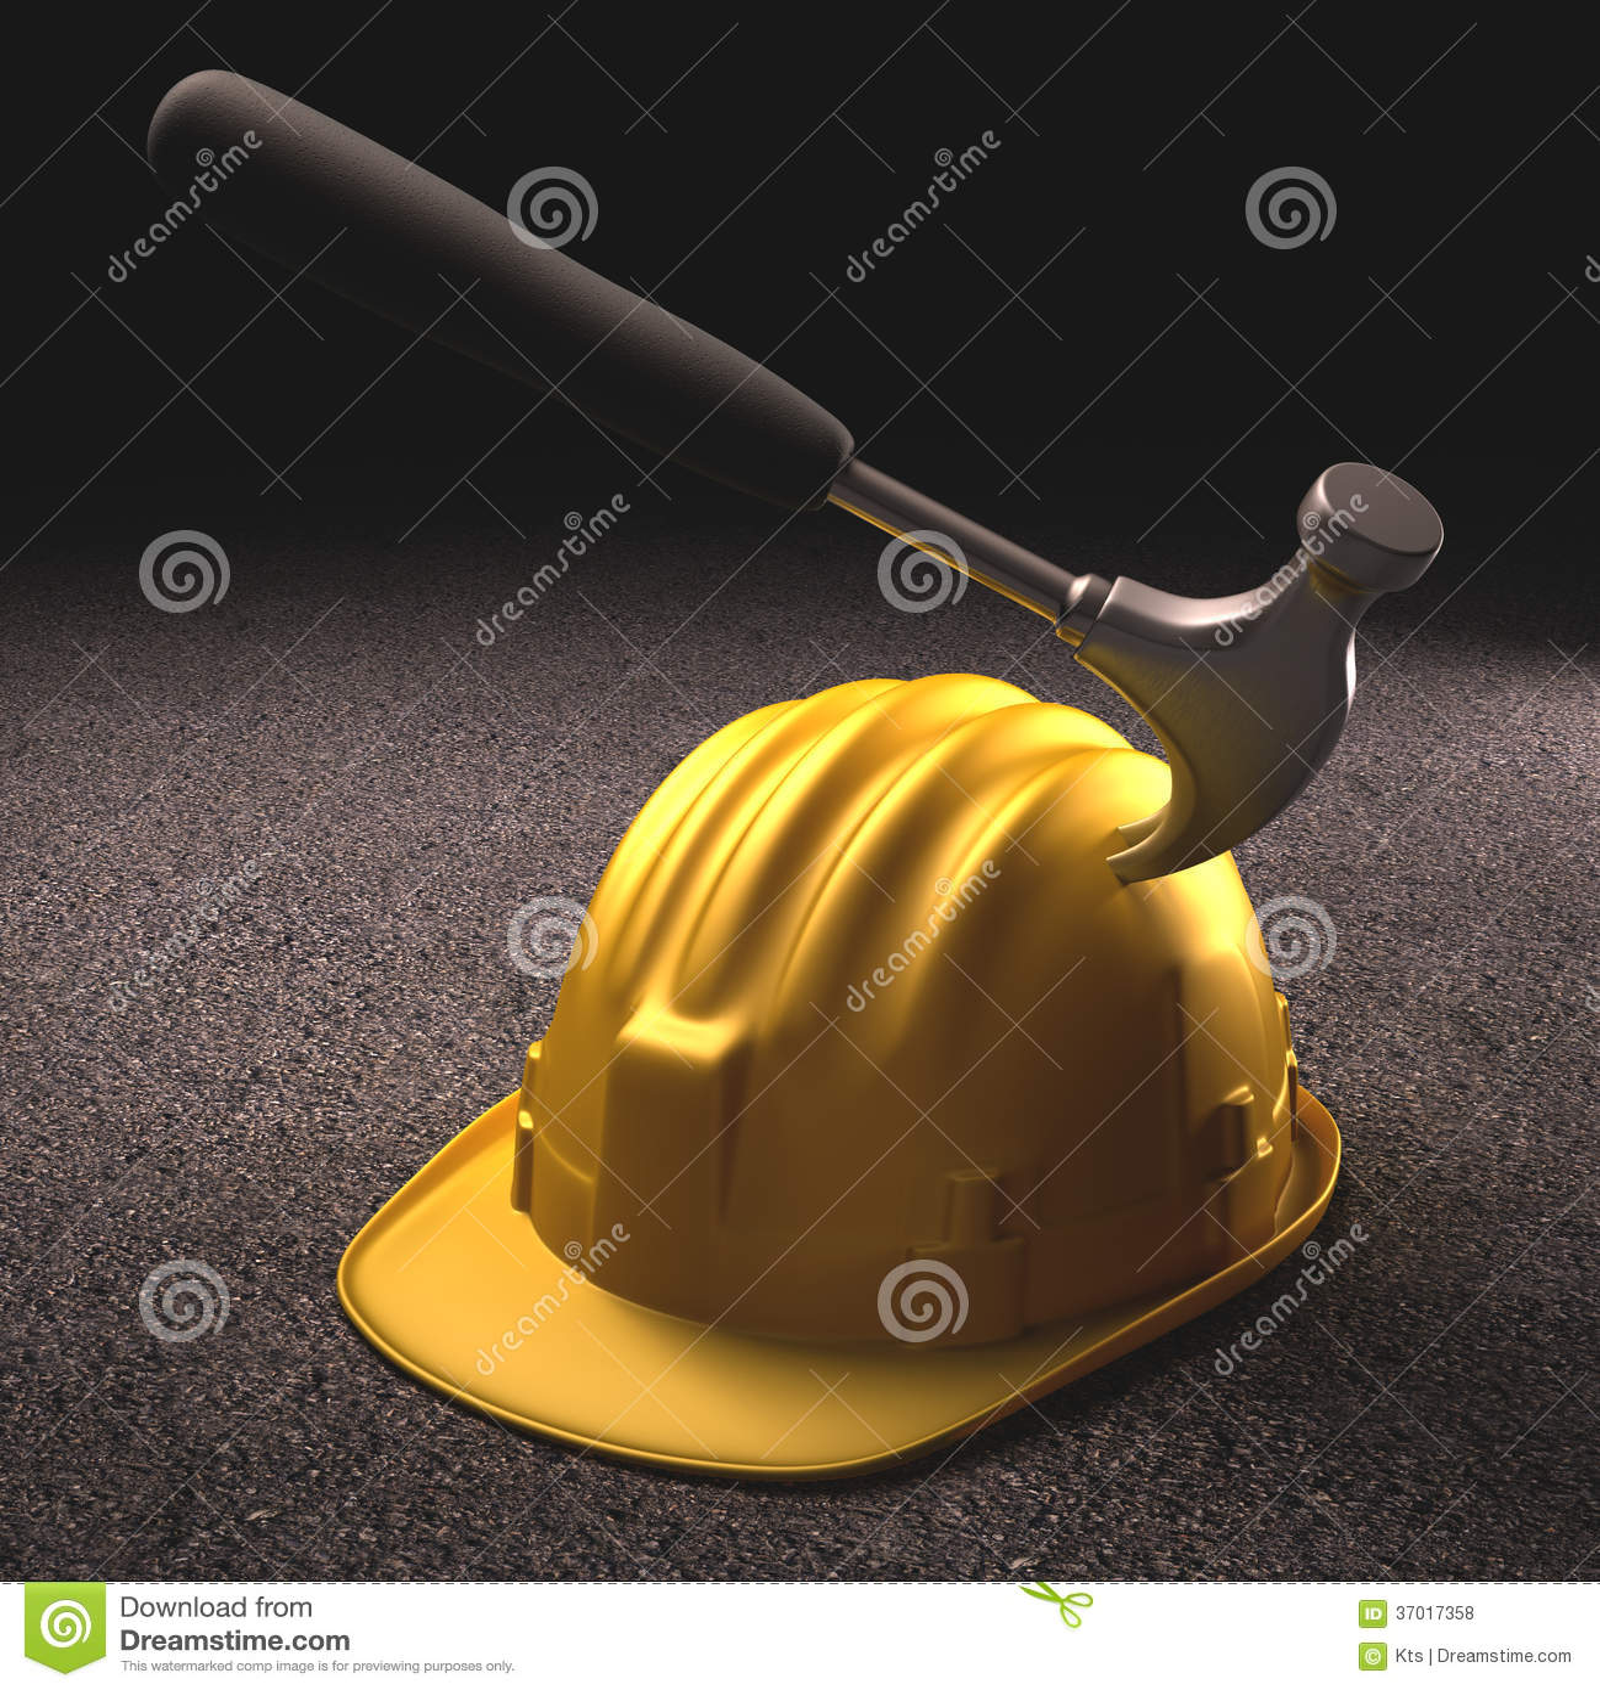 Hard Hat Accident stock illustration. Image of engineering ...